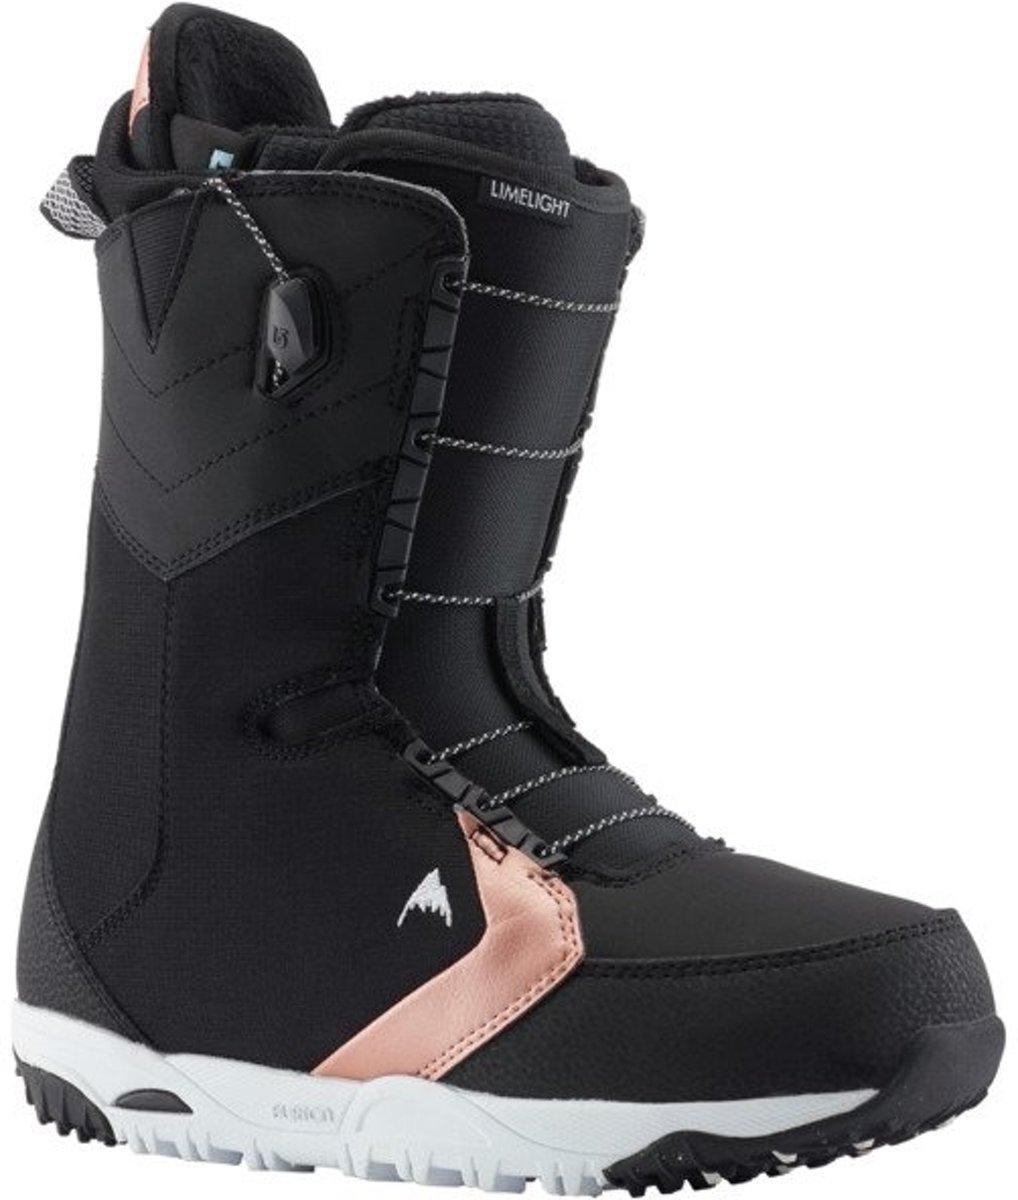 Burton Limelight snowboardschoenen zwart kopen